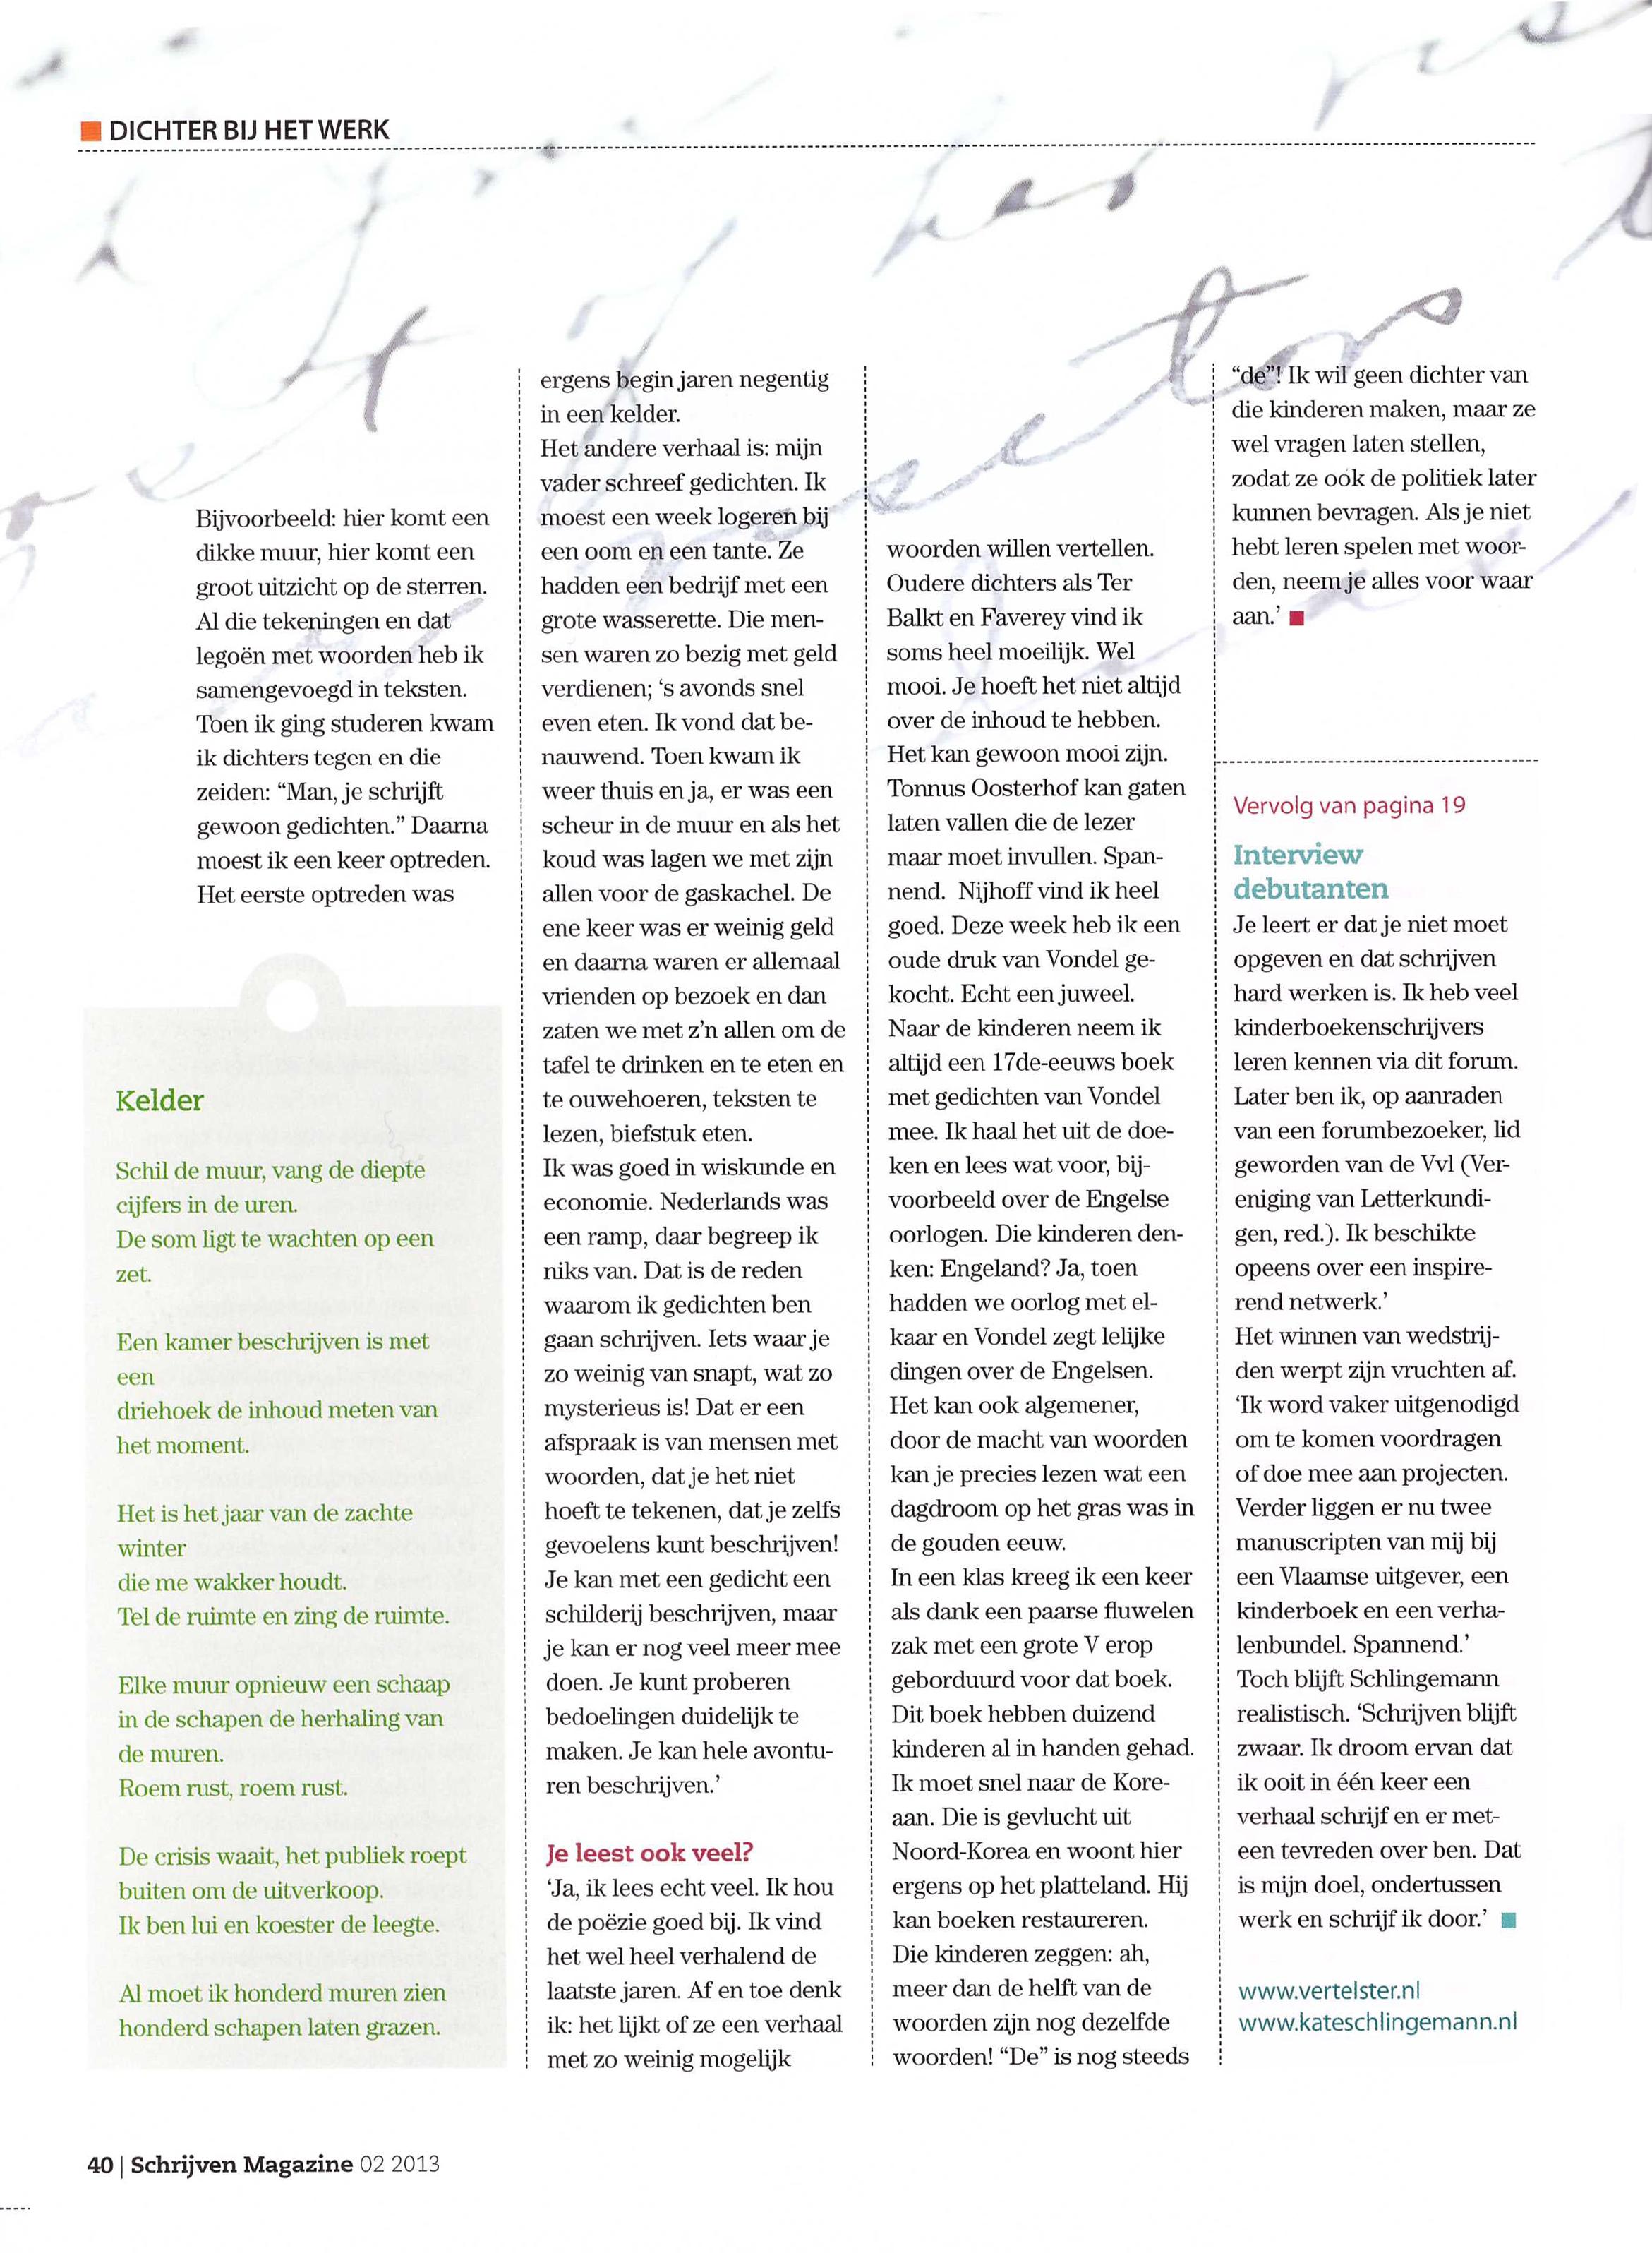 schrijven_magazine_vertelster_02